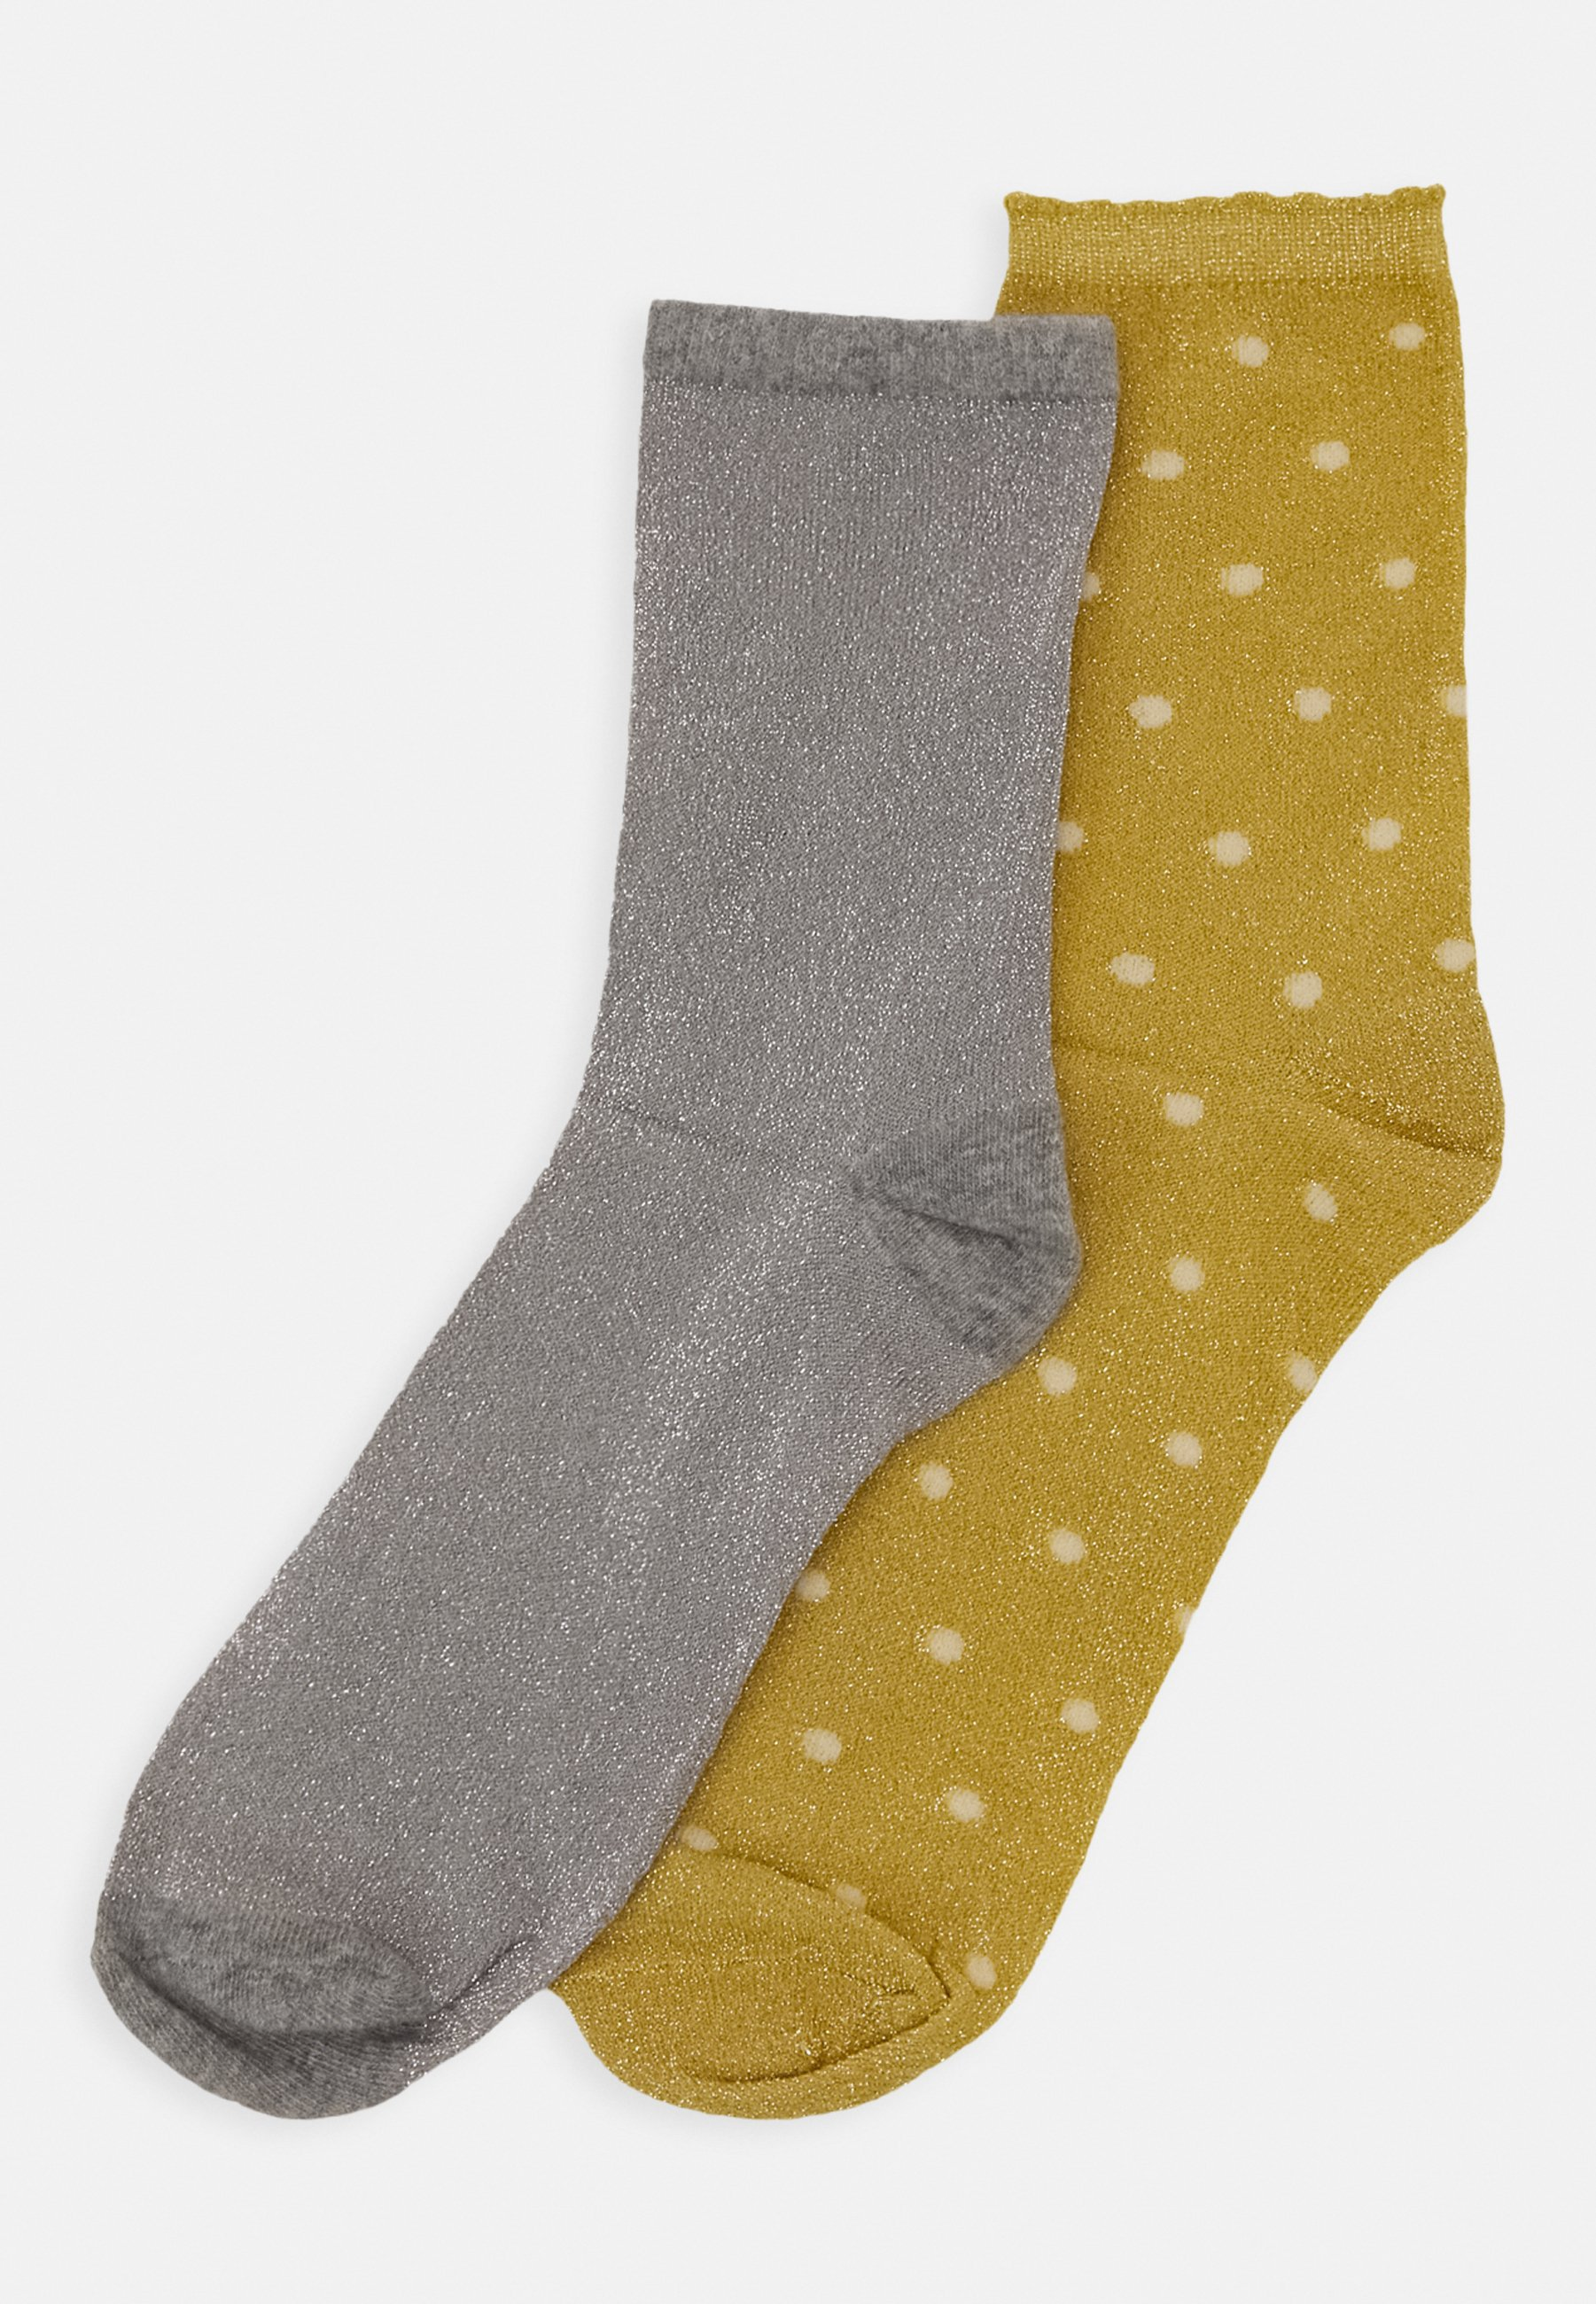 Femme MIX SOCK 2 PACK  - Chaussettes